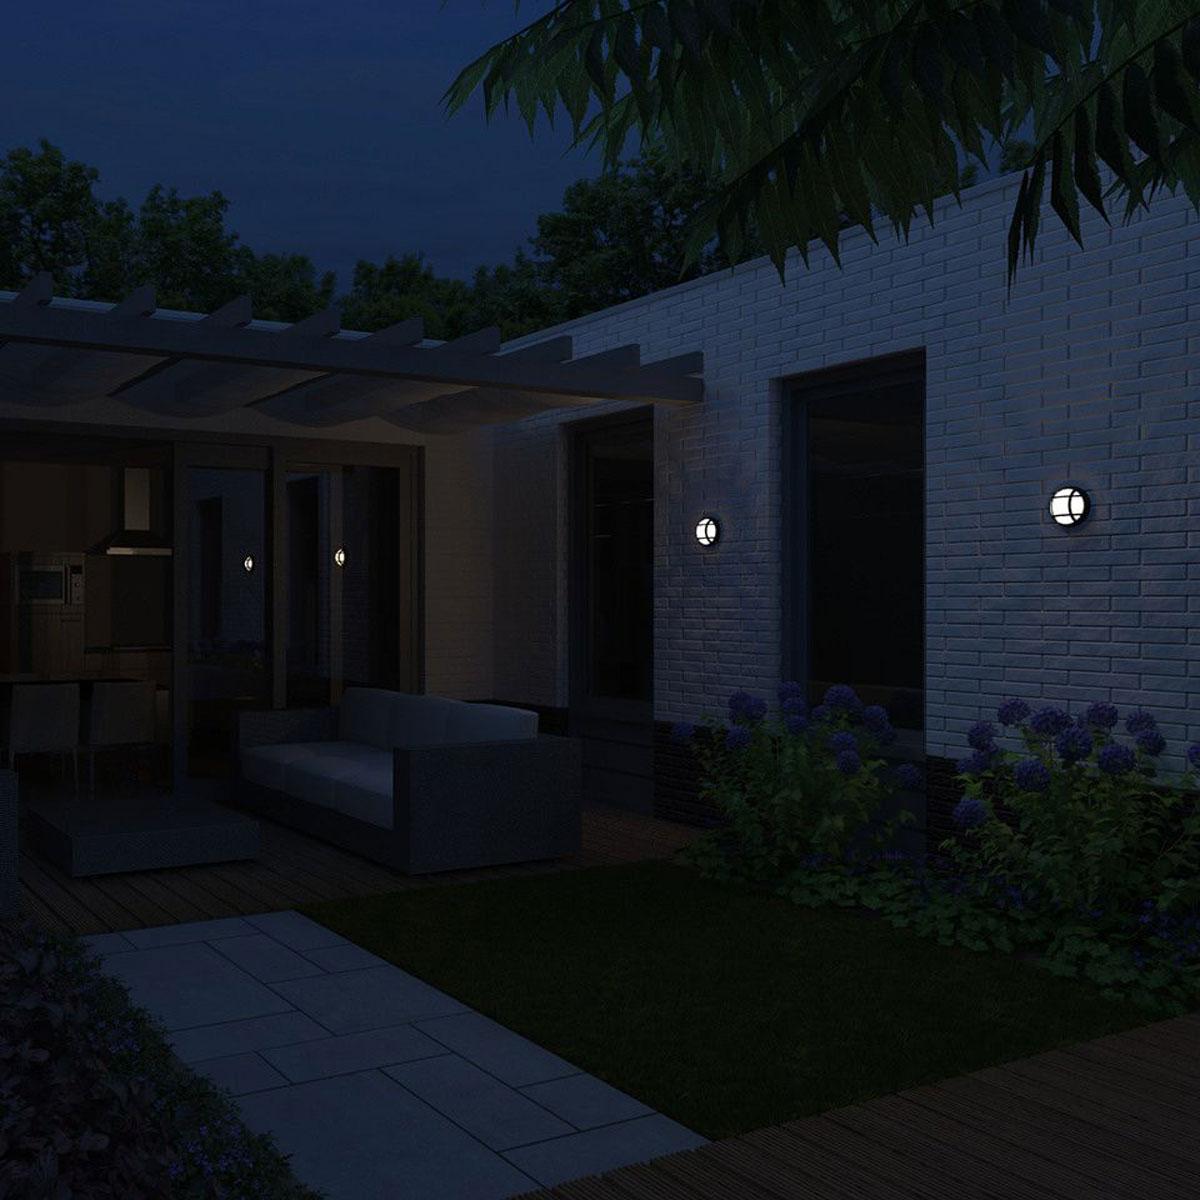 philips mygarden eagle wandlamp zwart. Black Bedroom Furniture Sets. Home Design Ideas